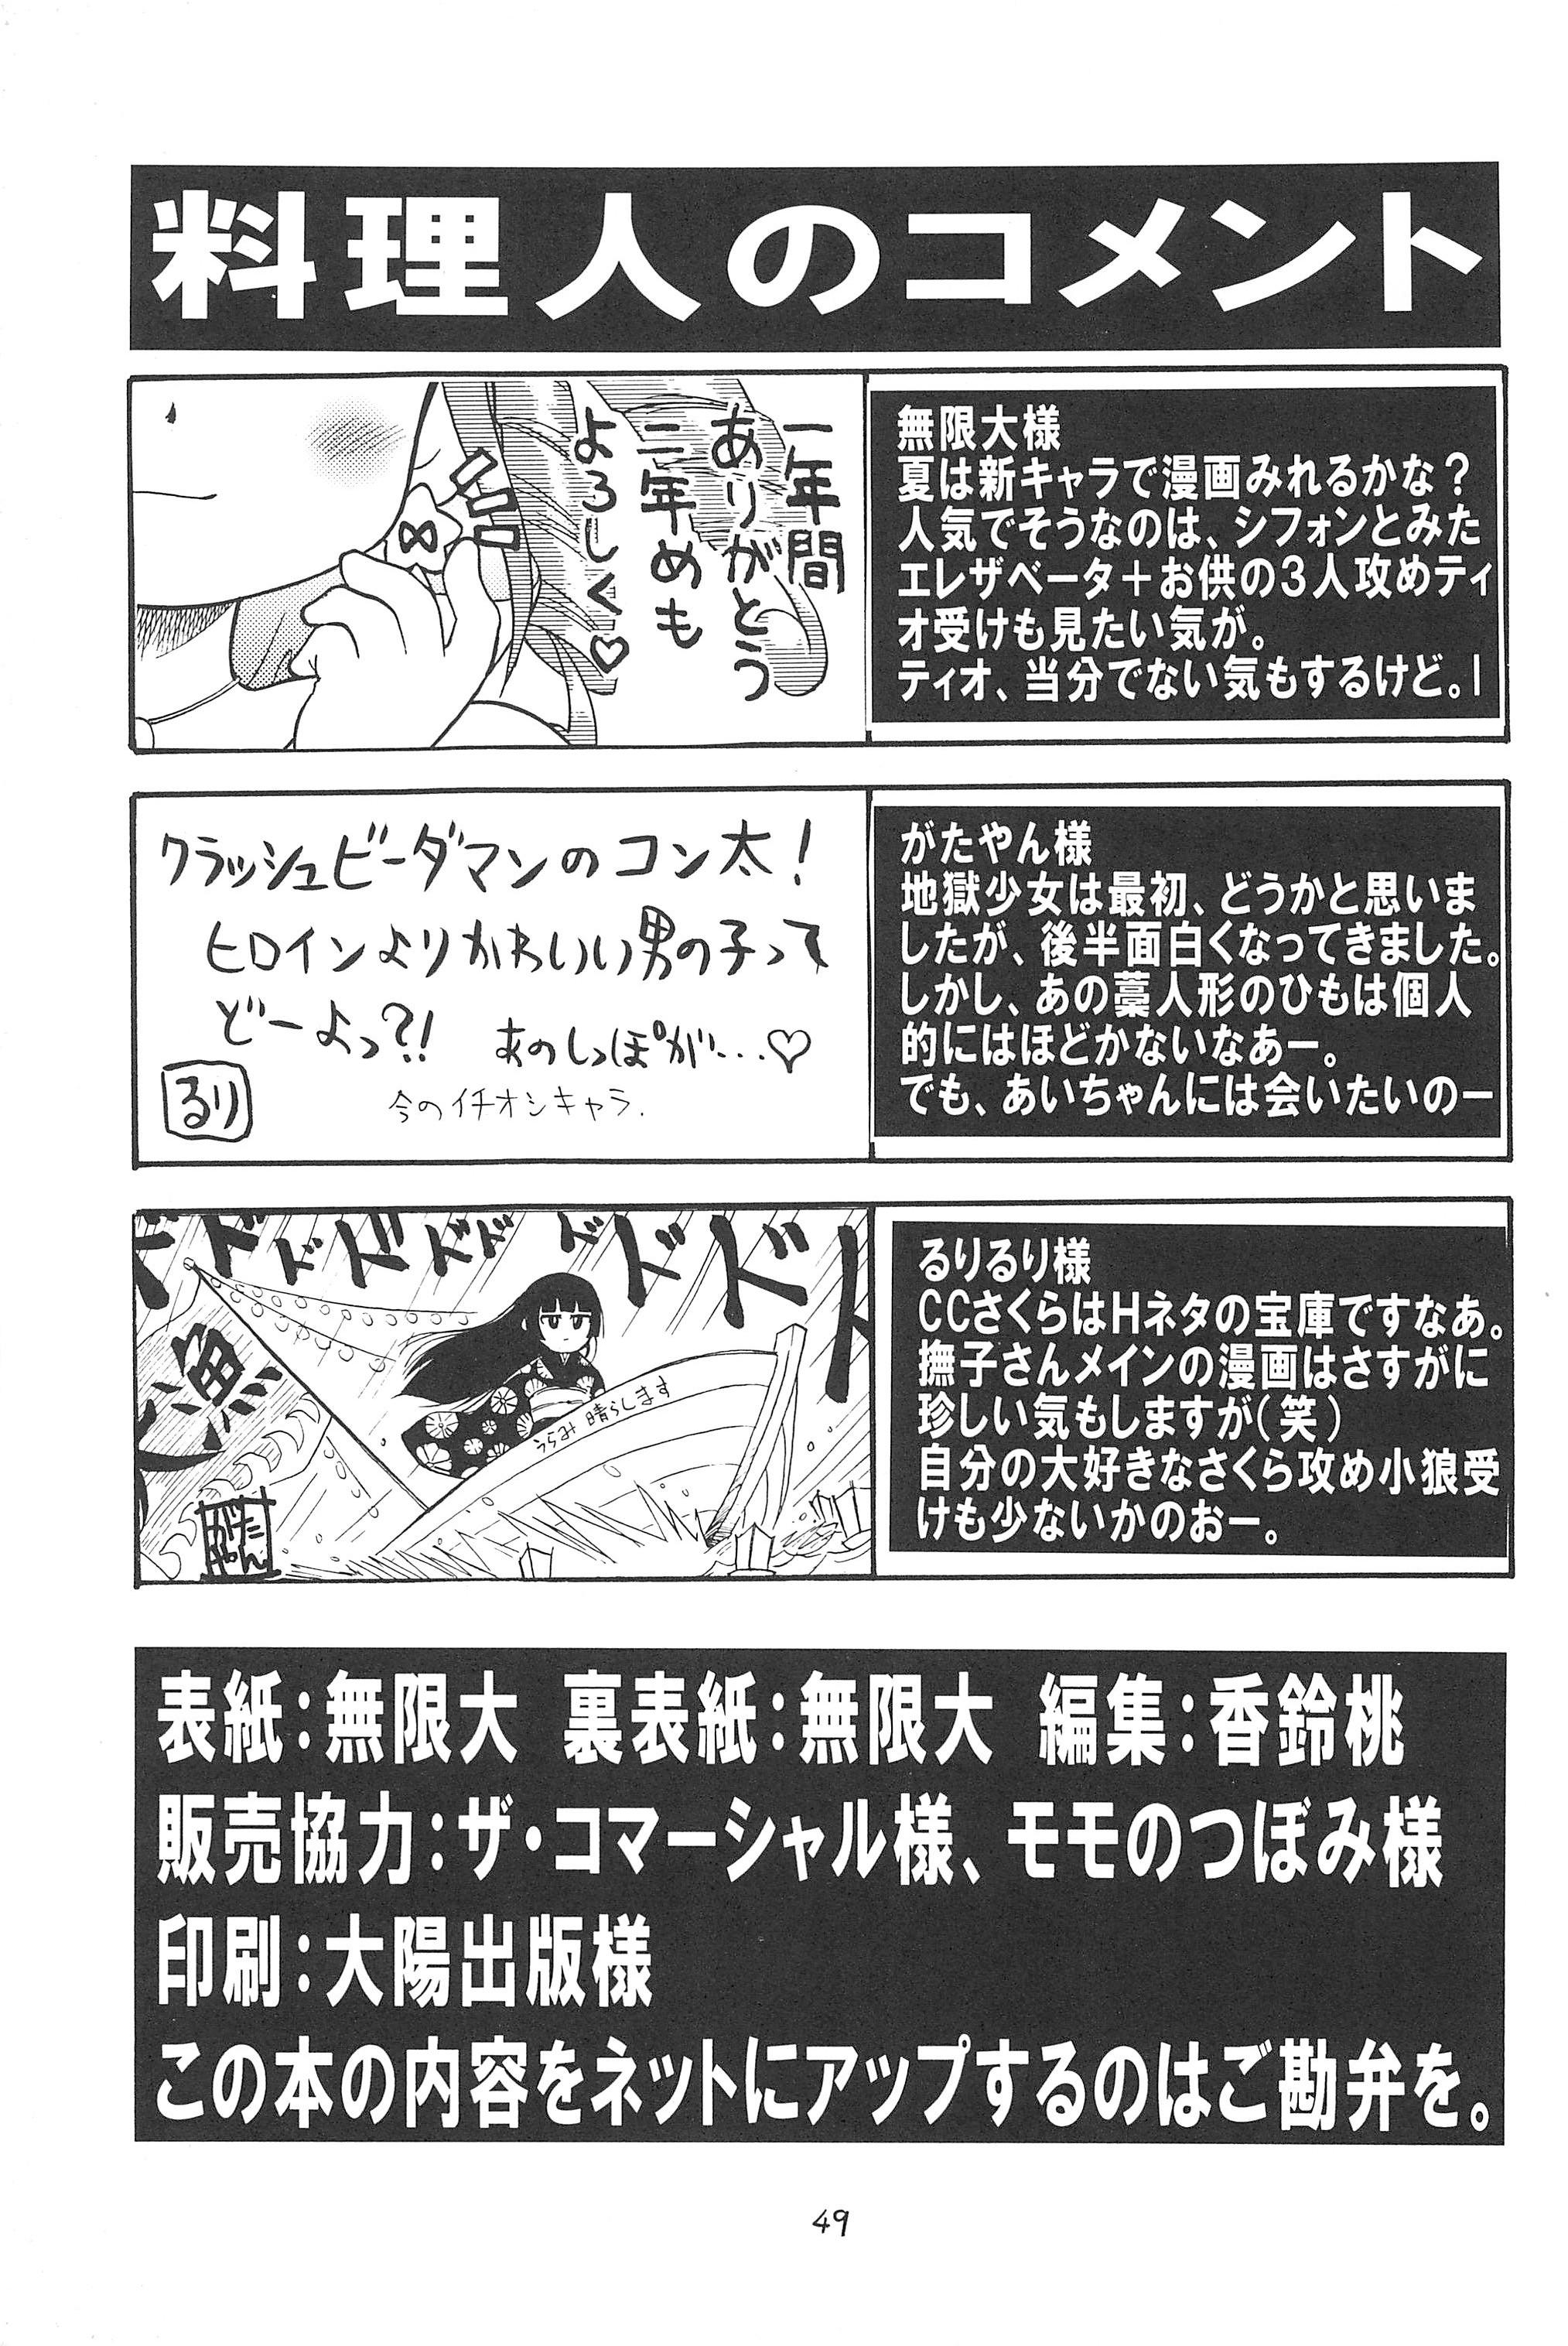 Higawari Obentou 48